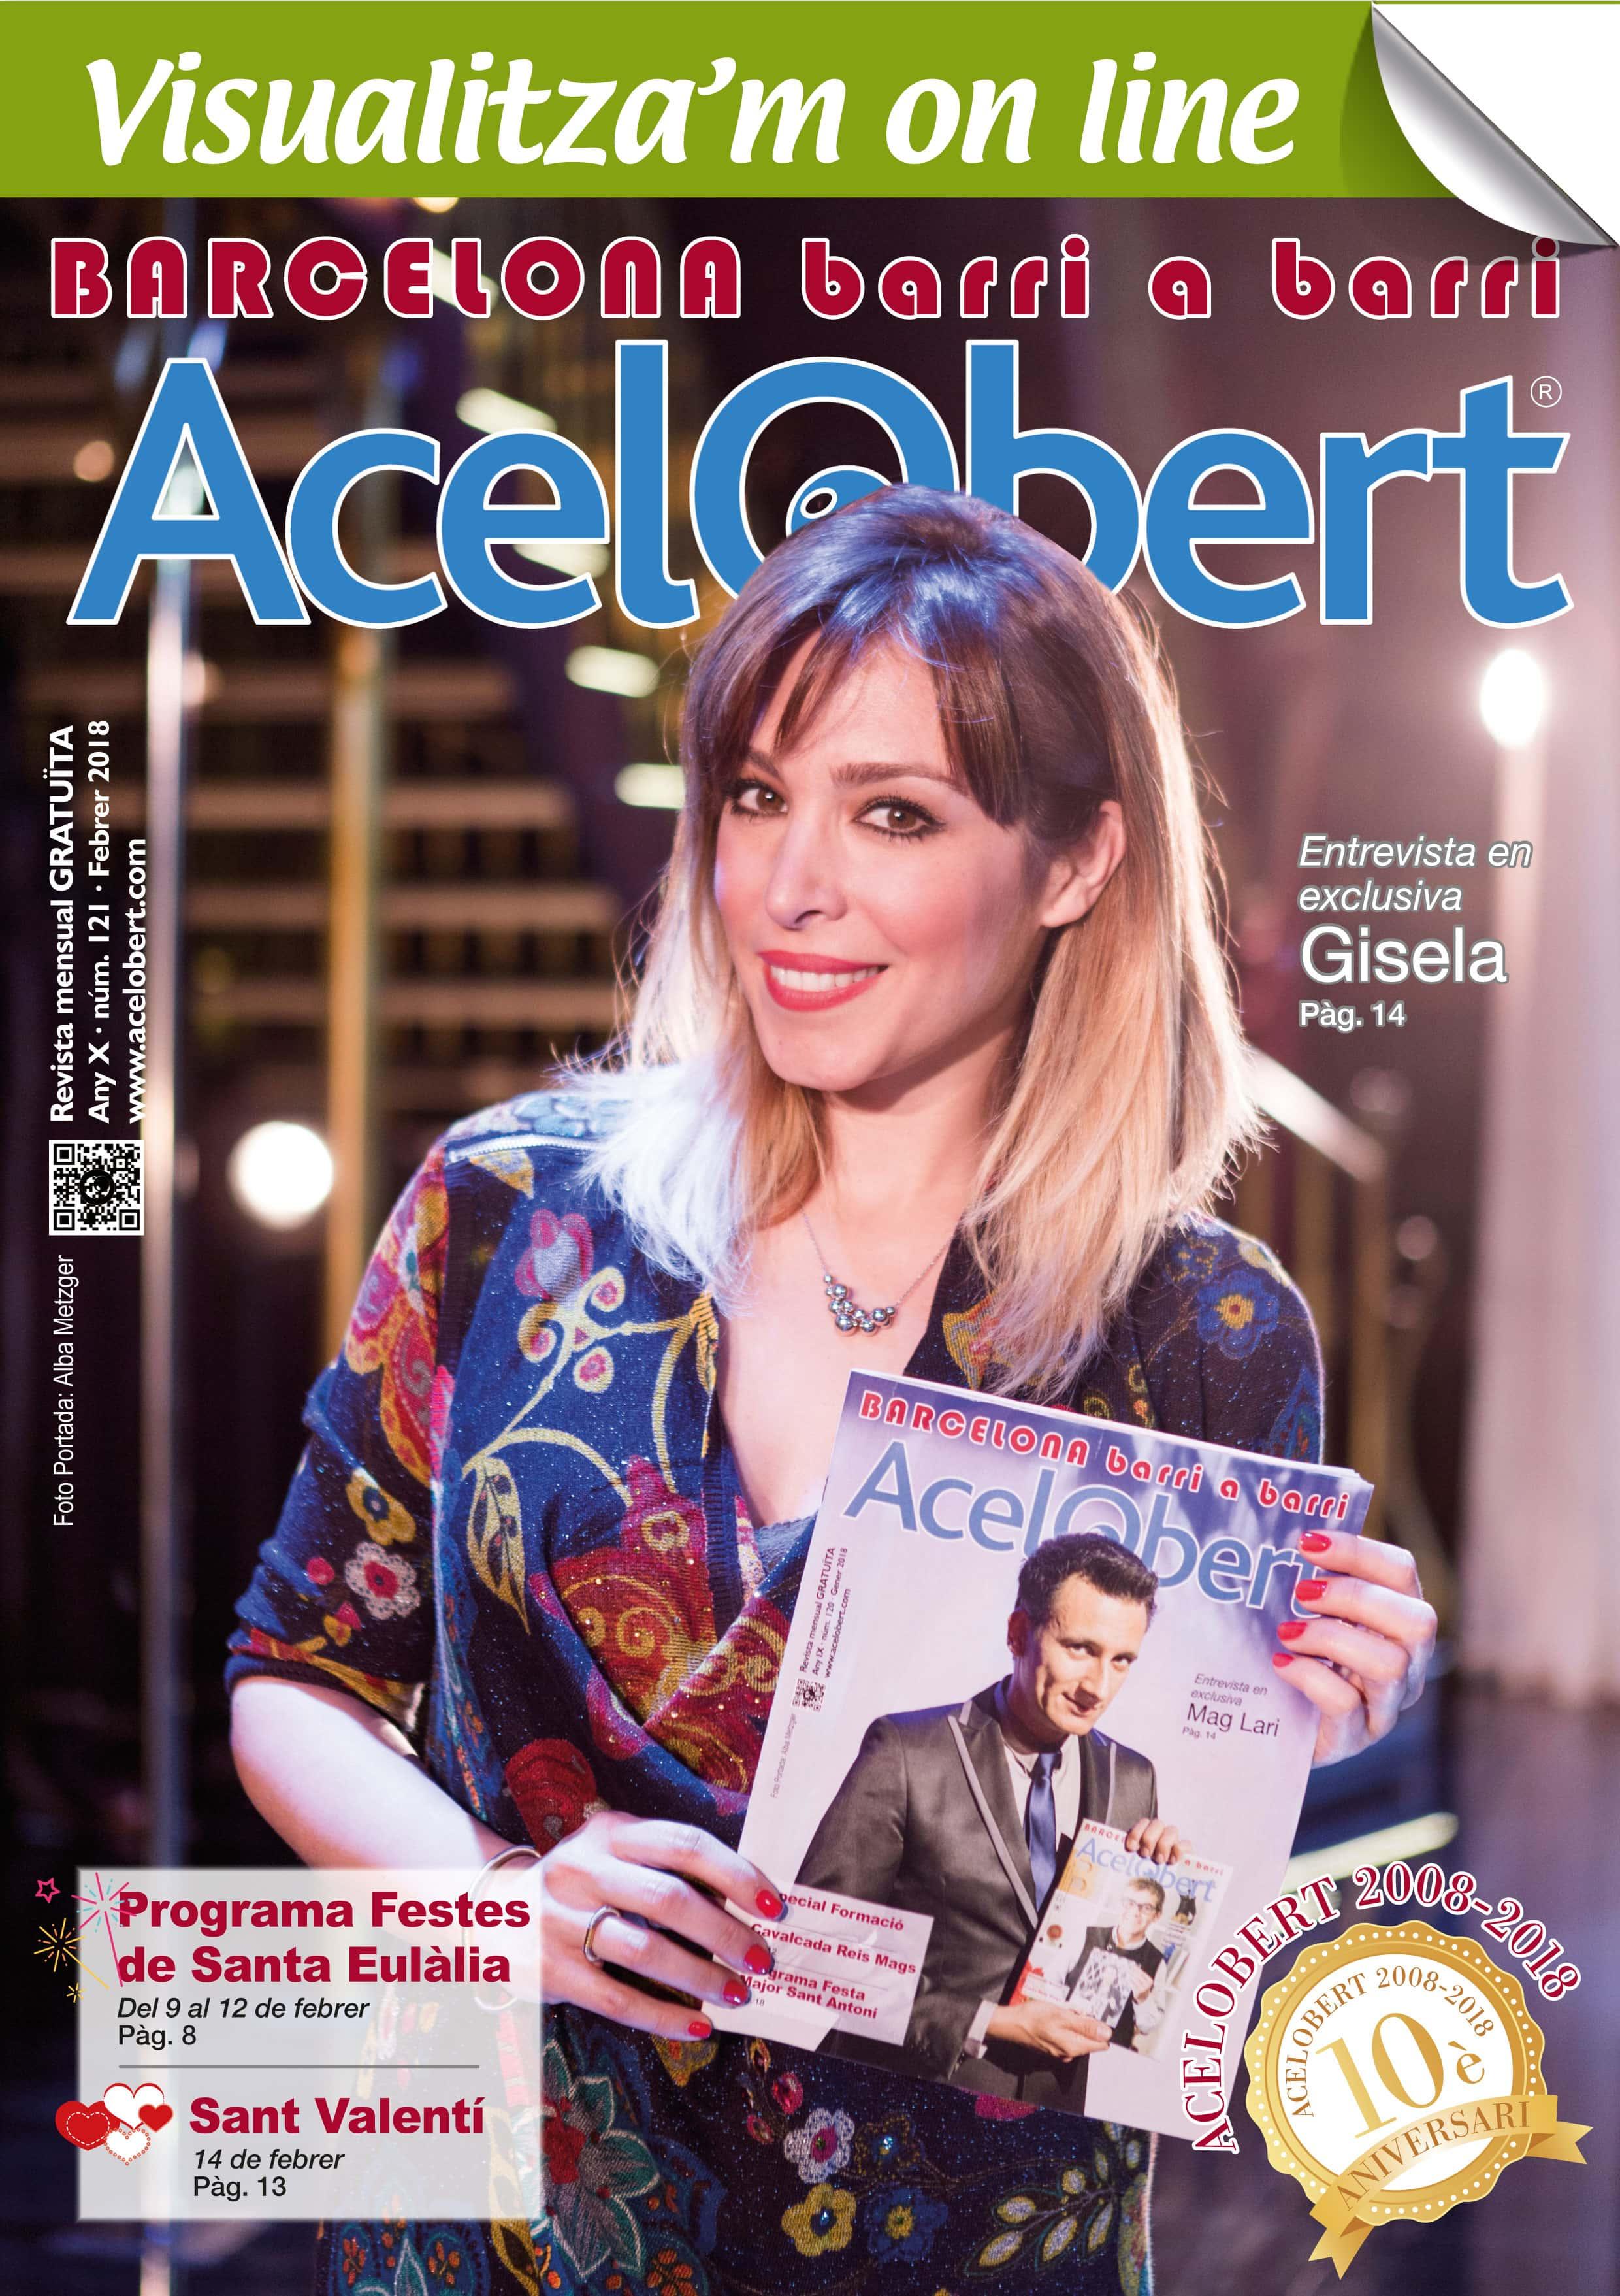 Acelobert Barcelona nº 121 FEBRER 2018